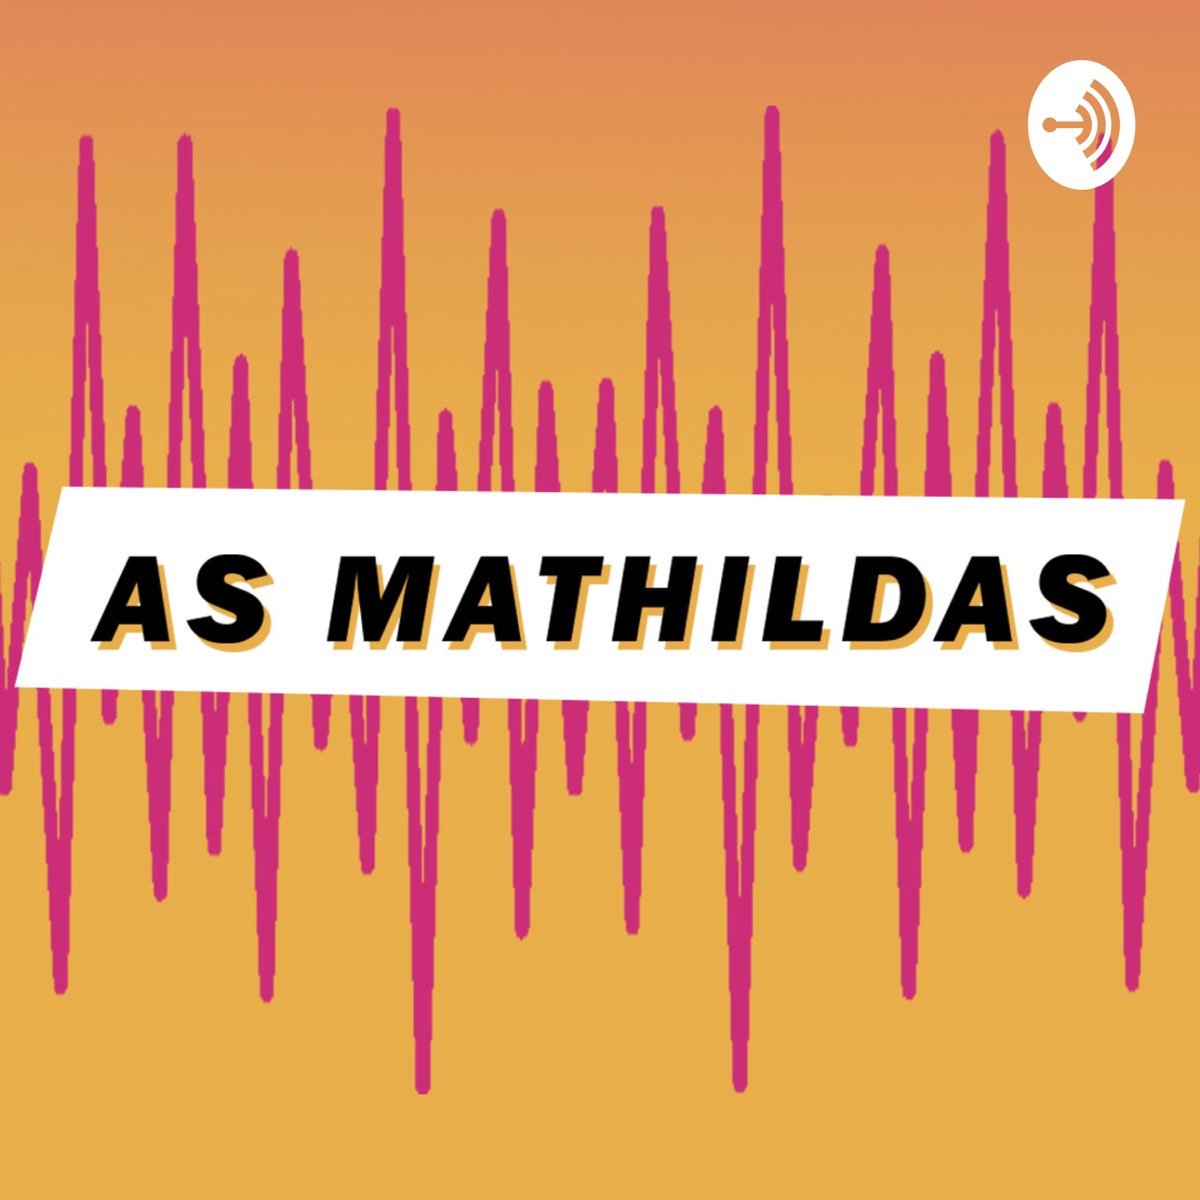 As Mathildas